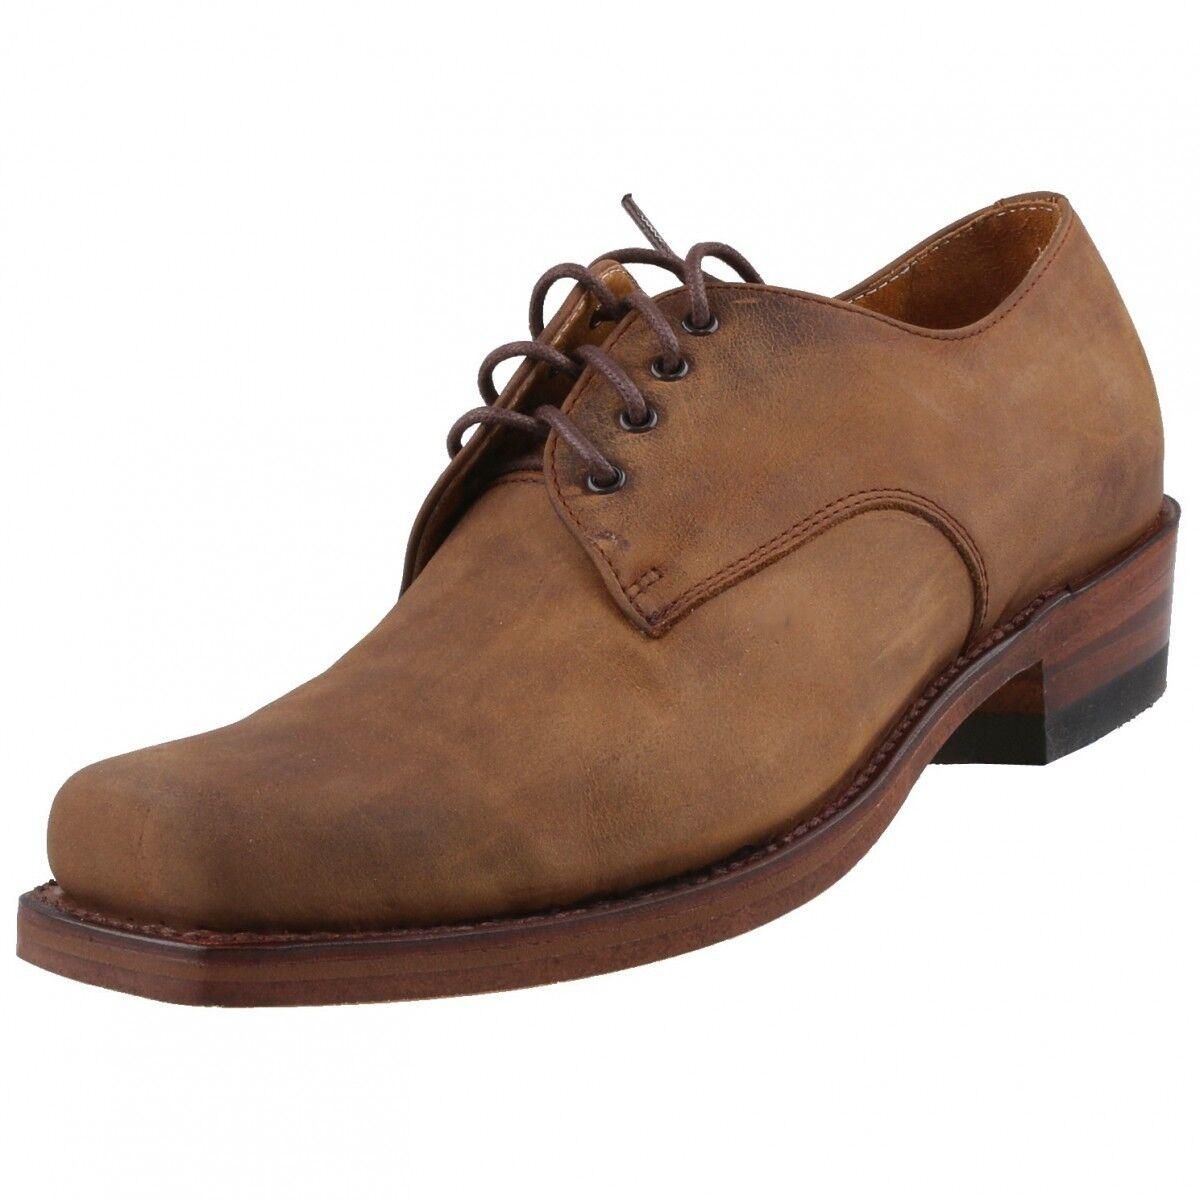 Neu SENDRA Stiefel Herrenschuhe 530 Halbschuhe Schnürschuhe Leder Schuhe Biker